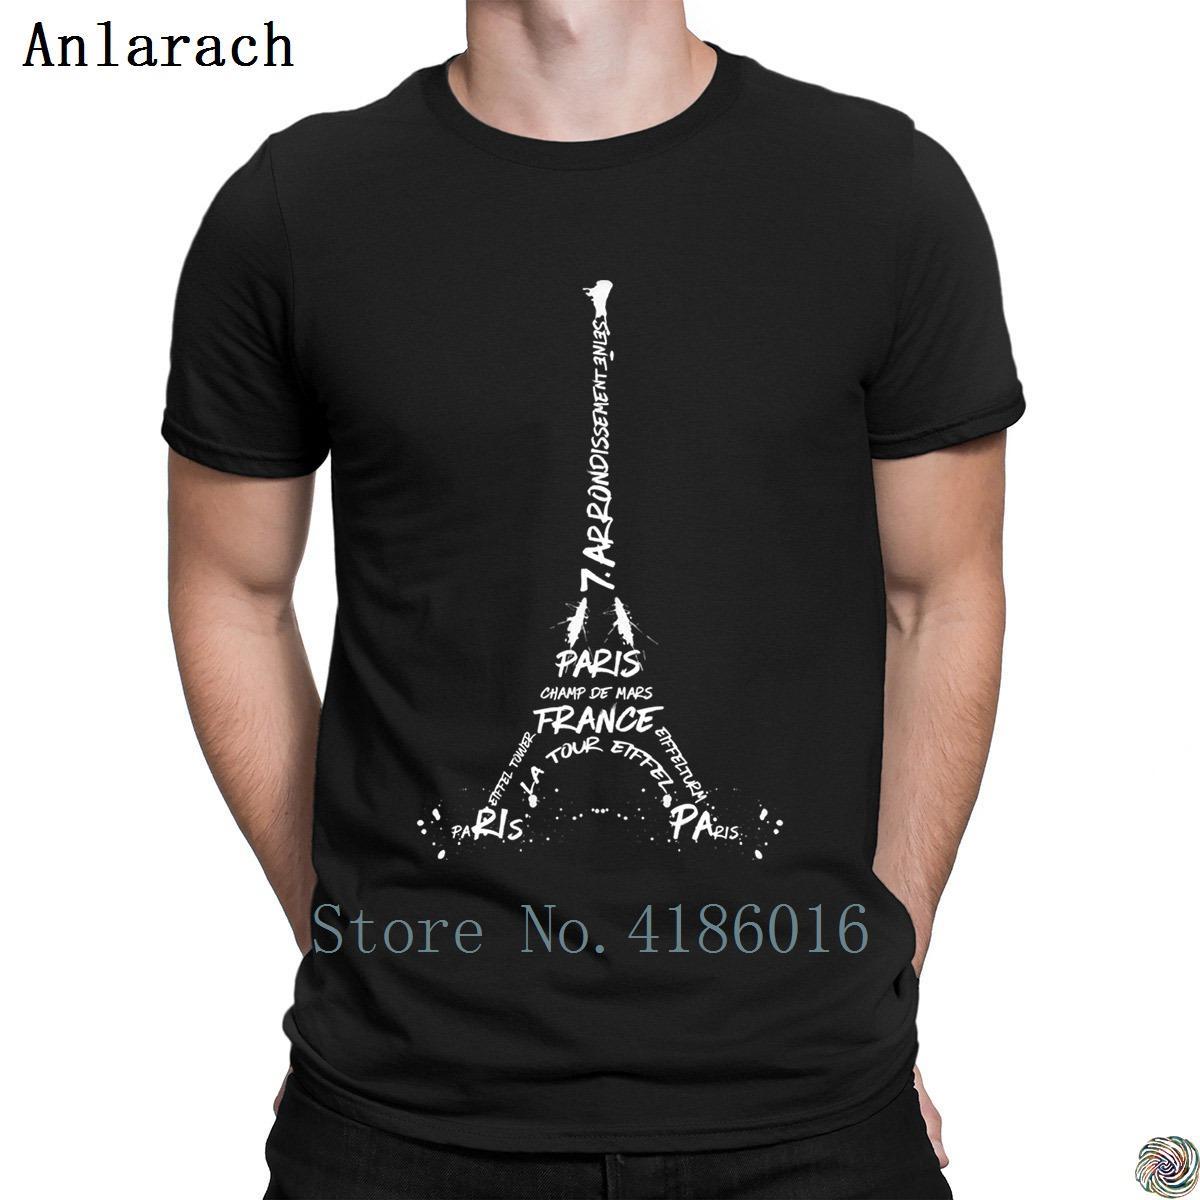 Eiffel Digital Designer Acquista Art Shirt Costume Torre T Graphic gy7Yf6bv